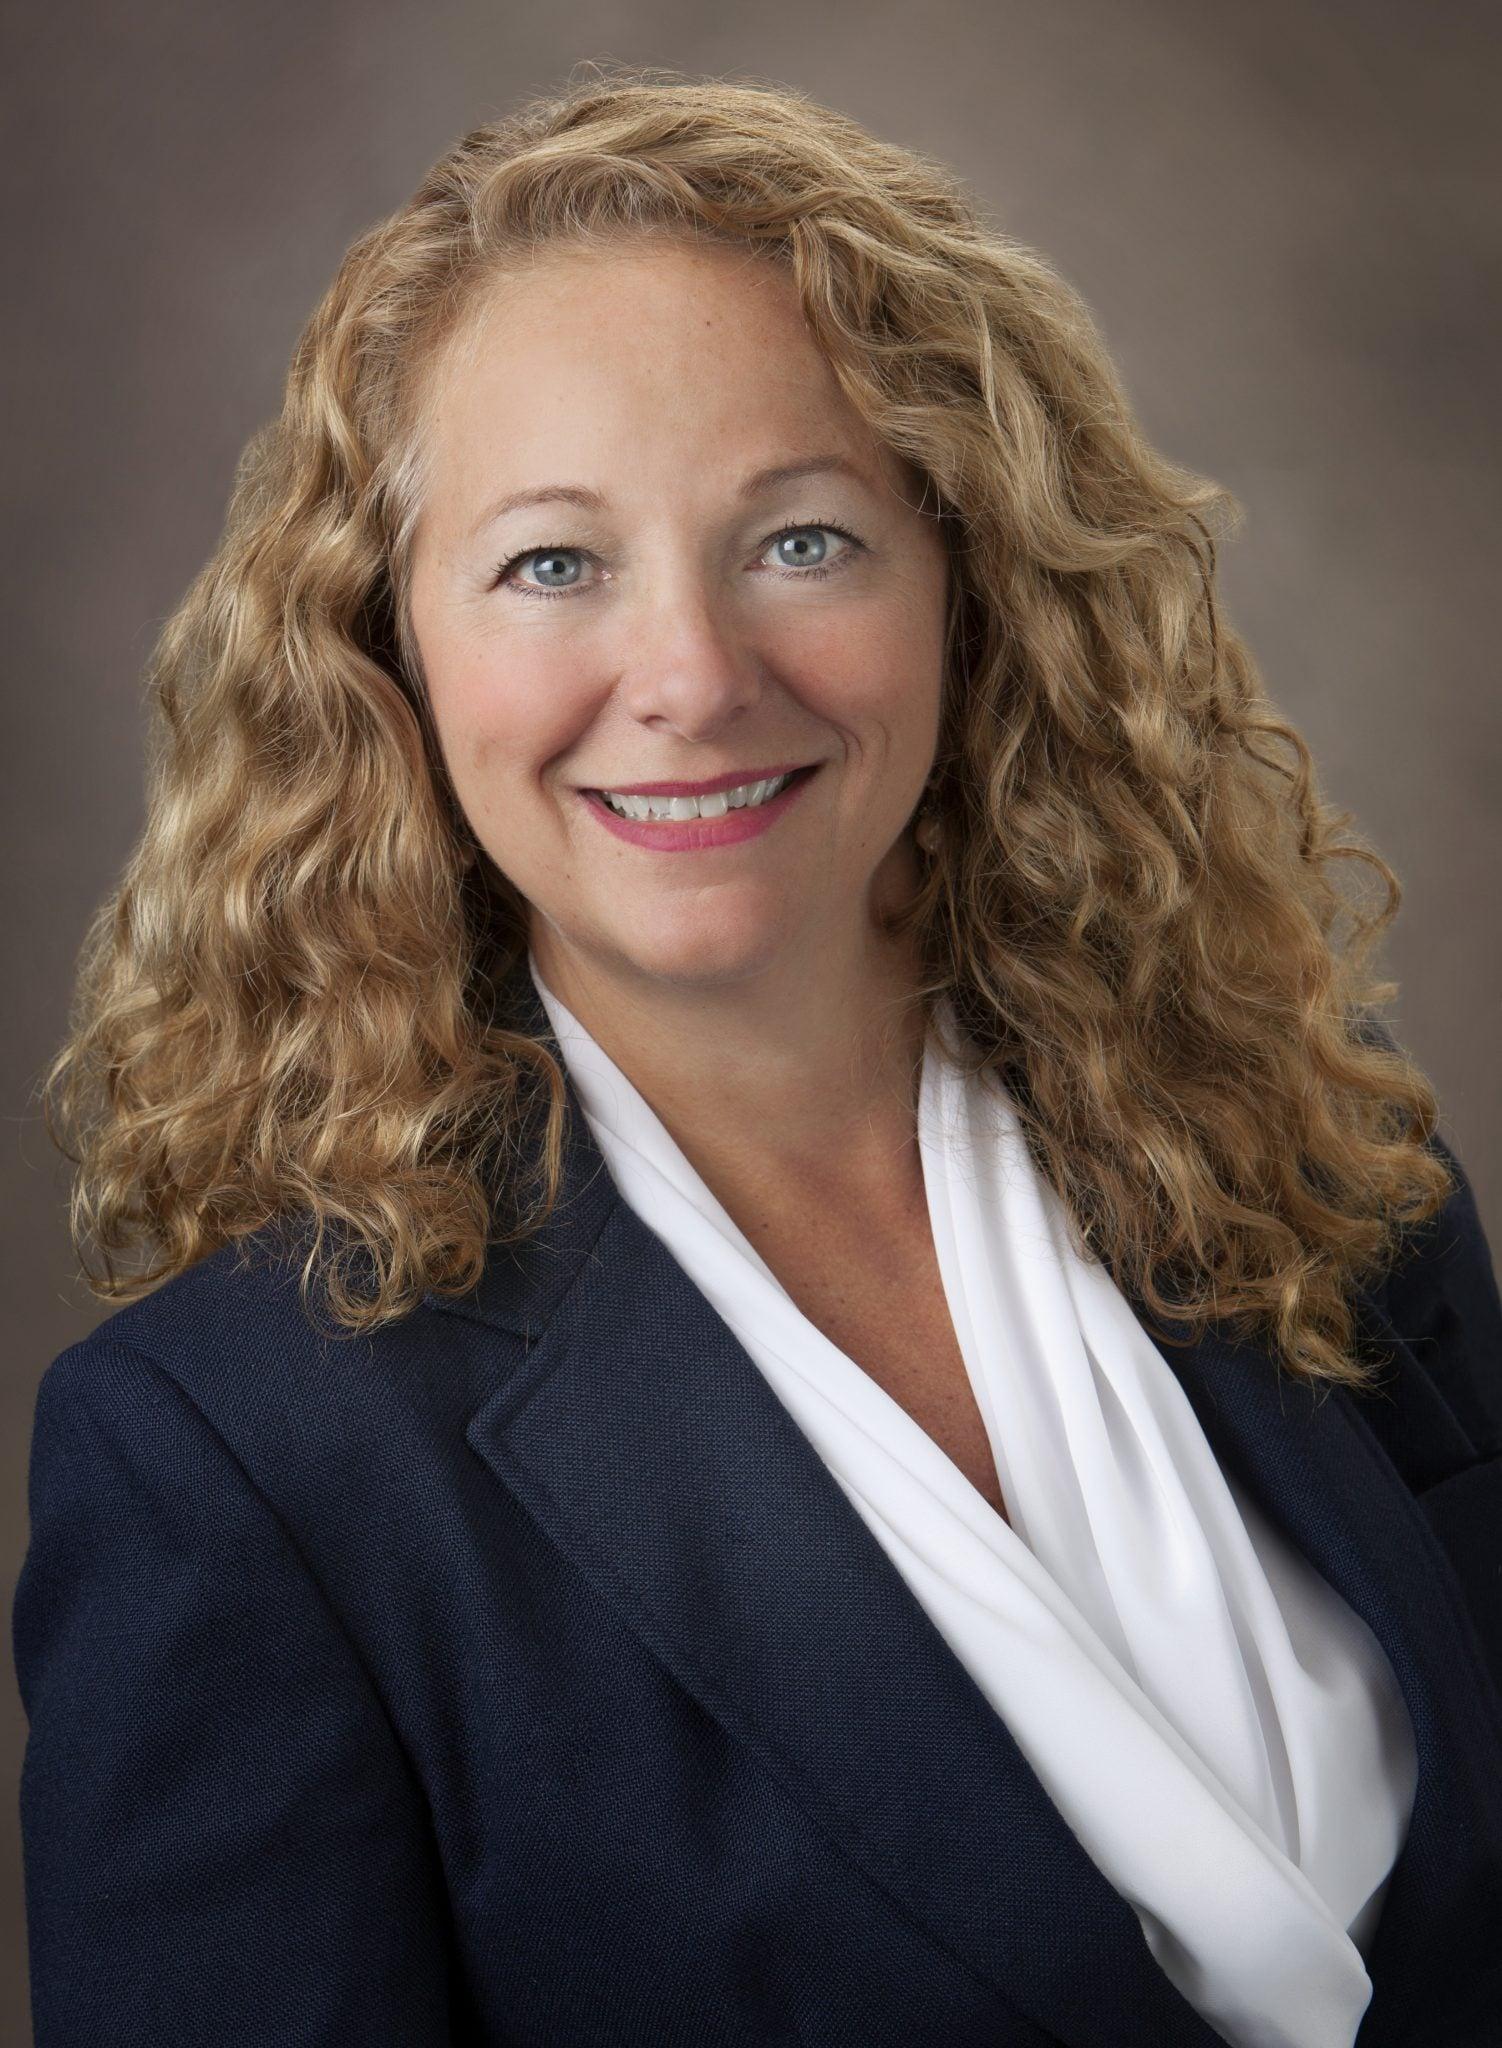 Lori Wertz